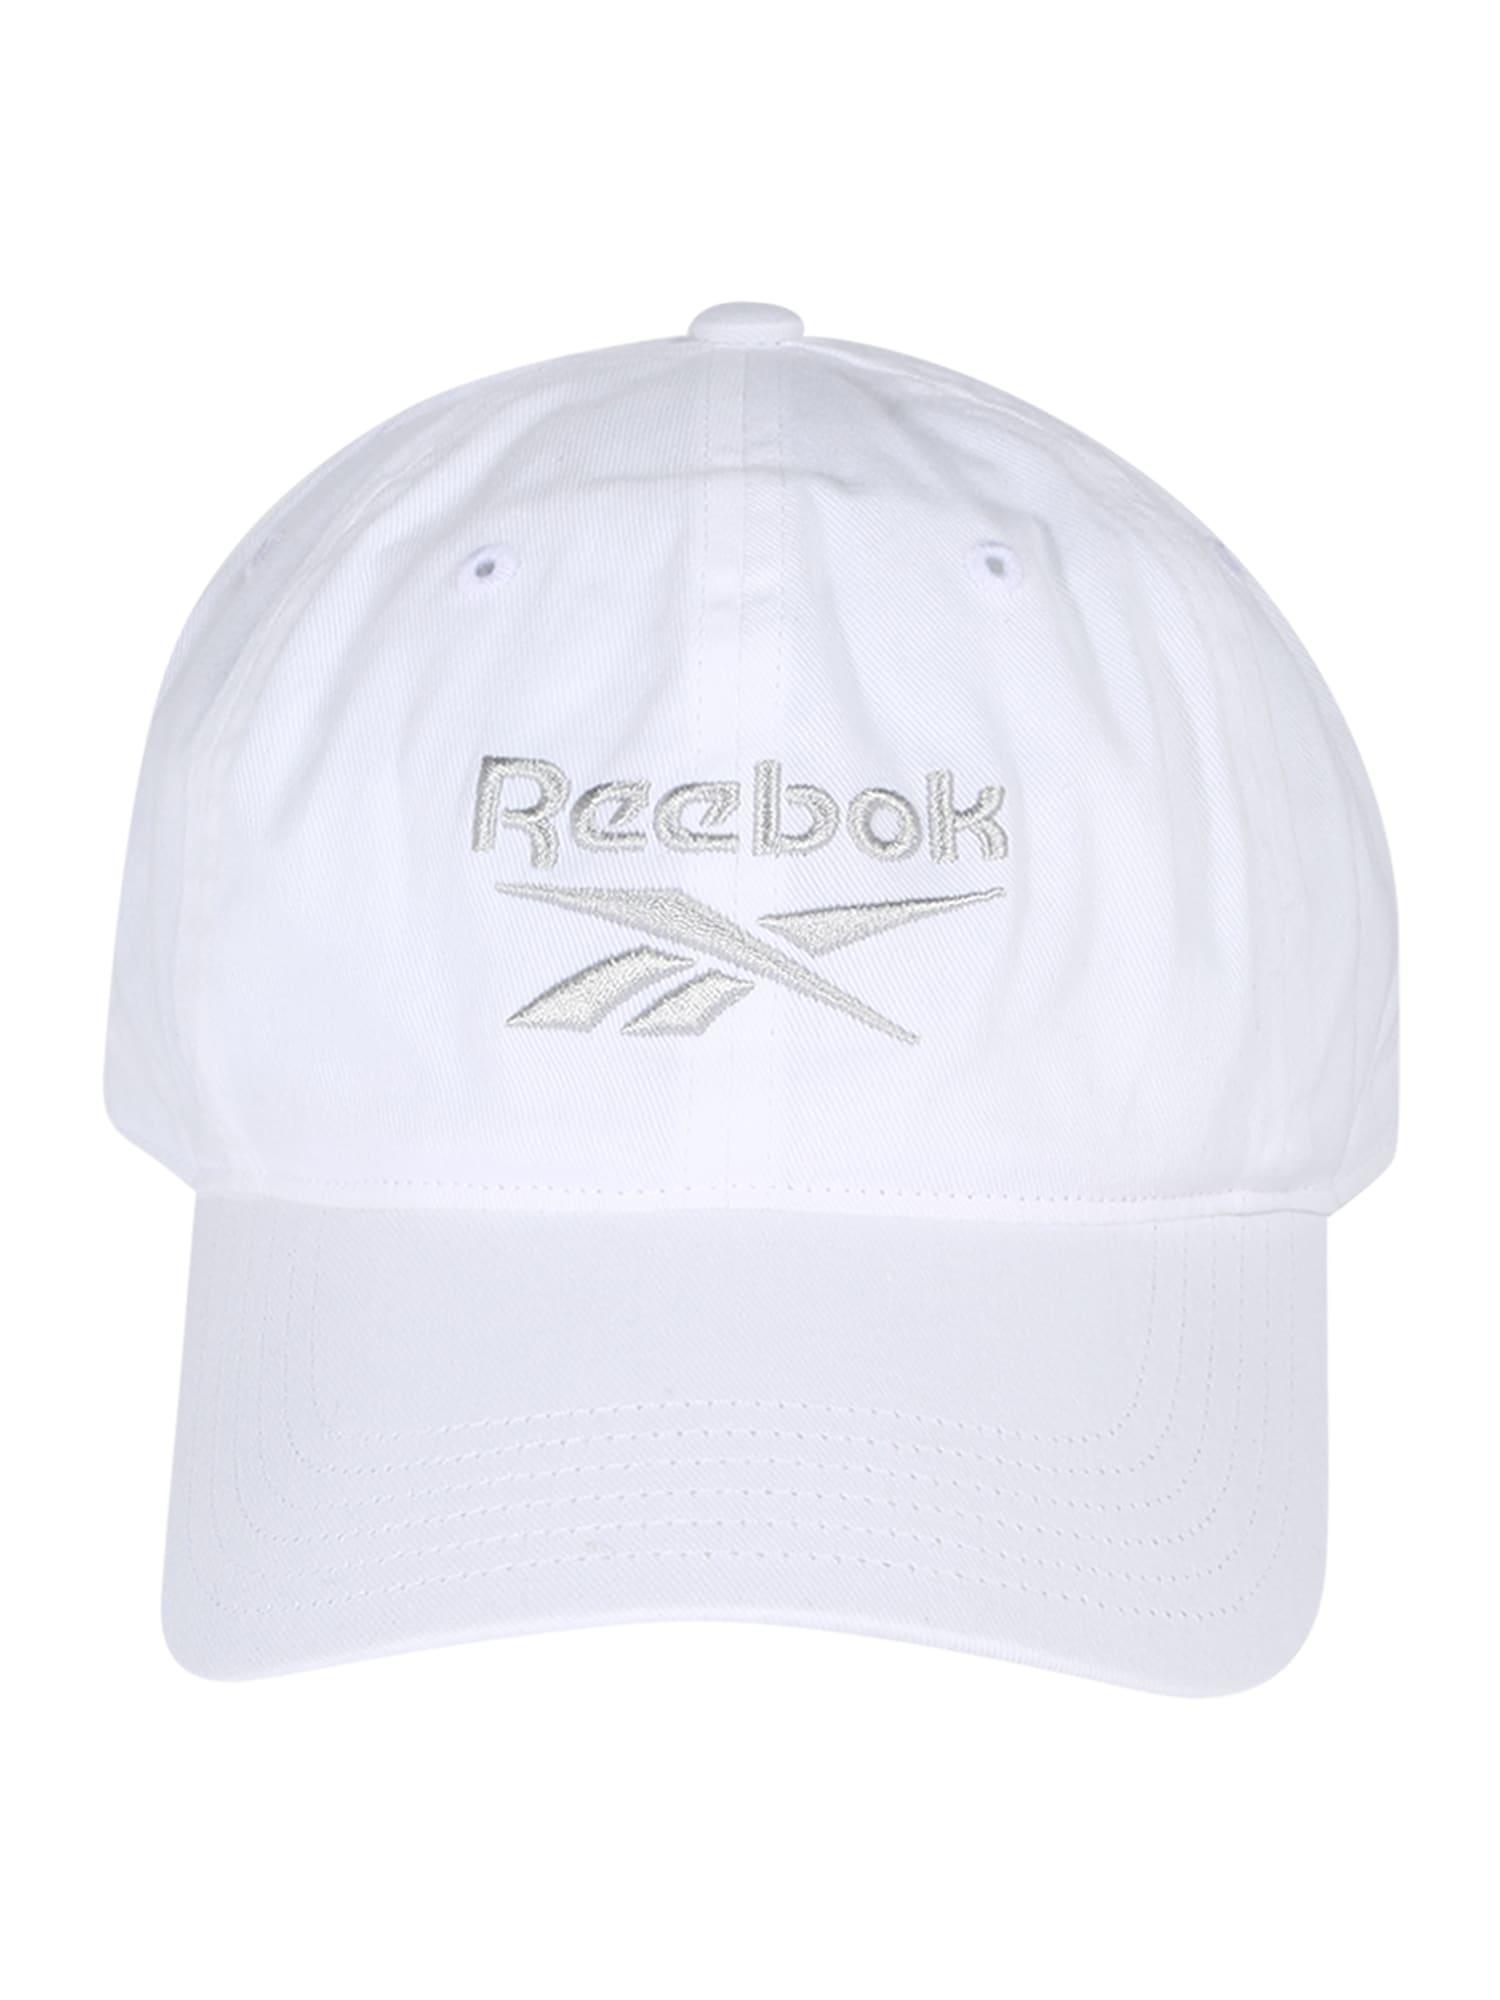 REEBOK Sportinė kepurė balta